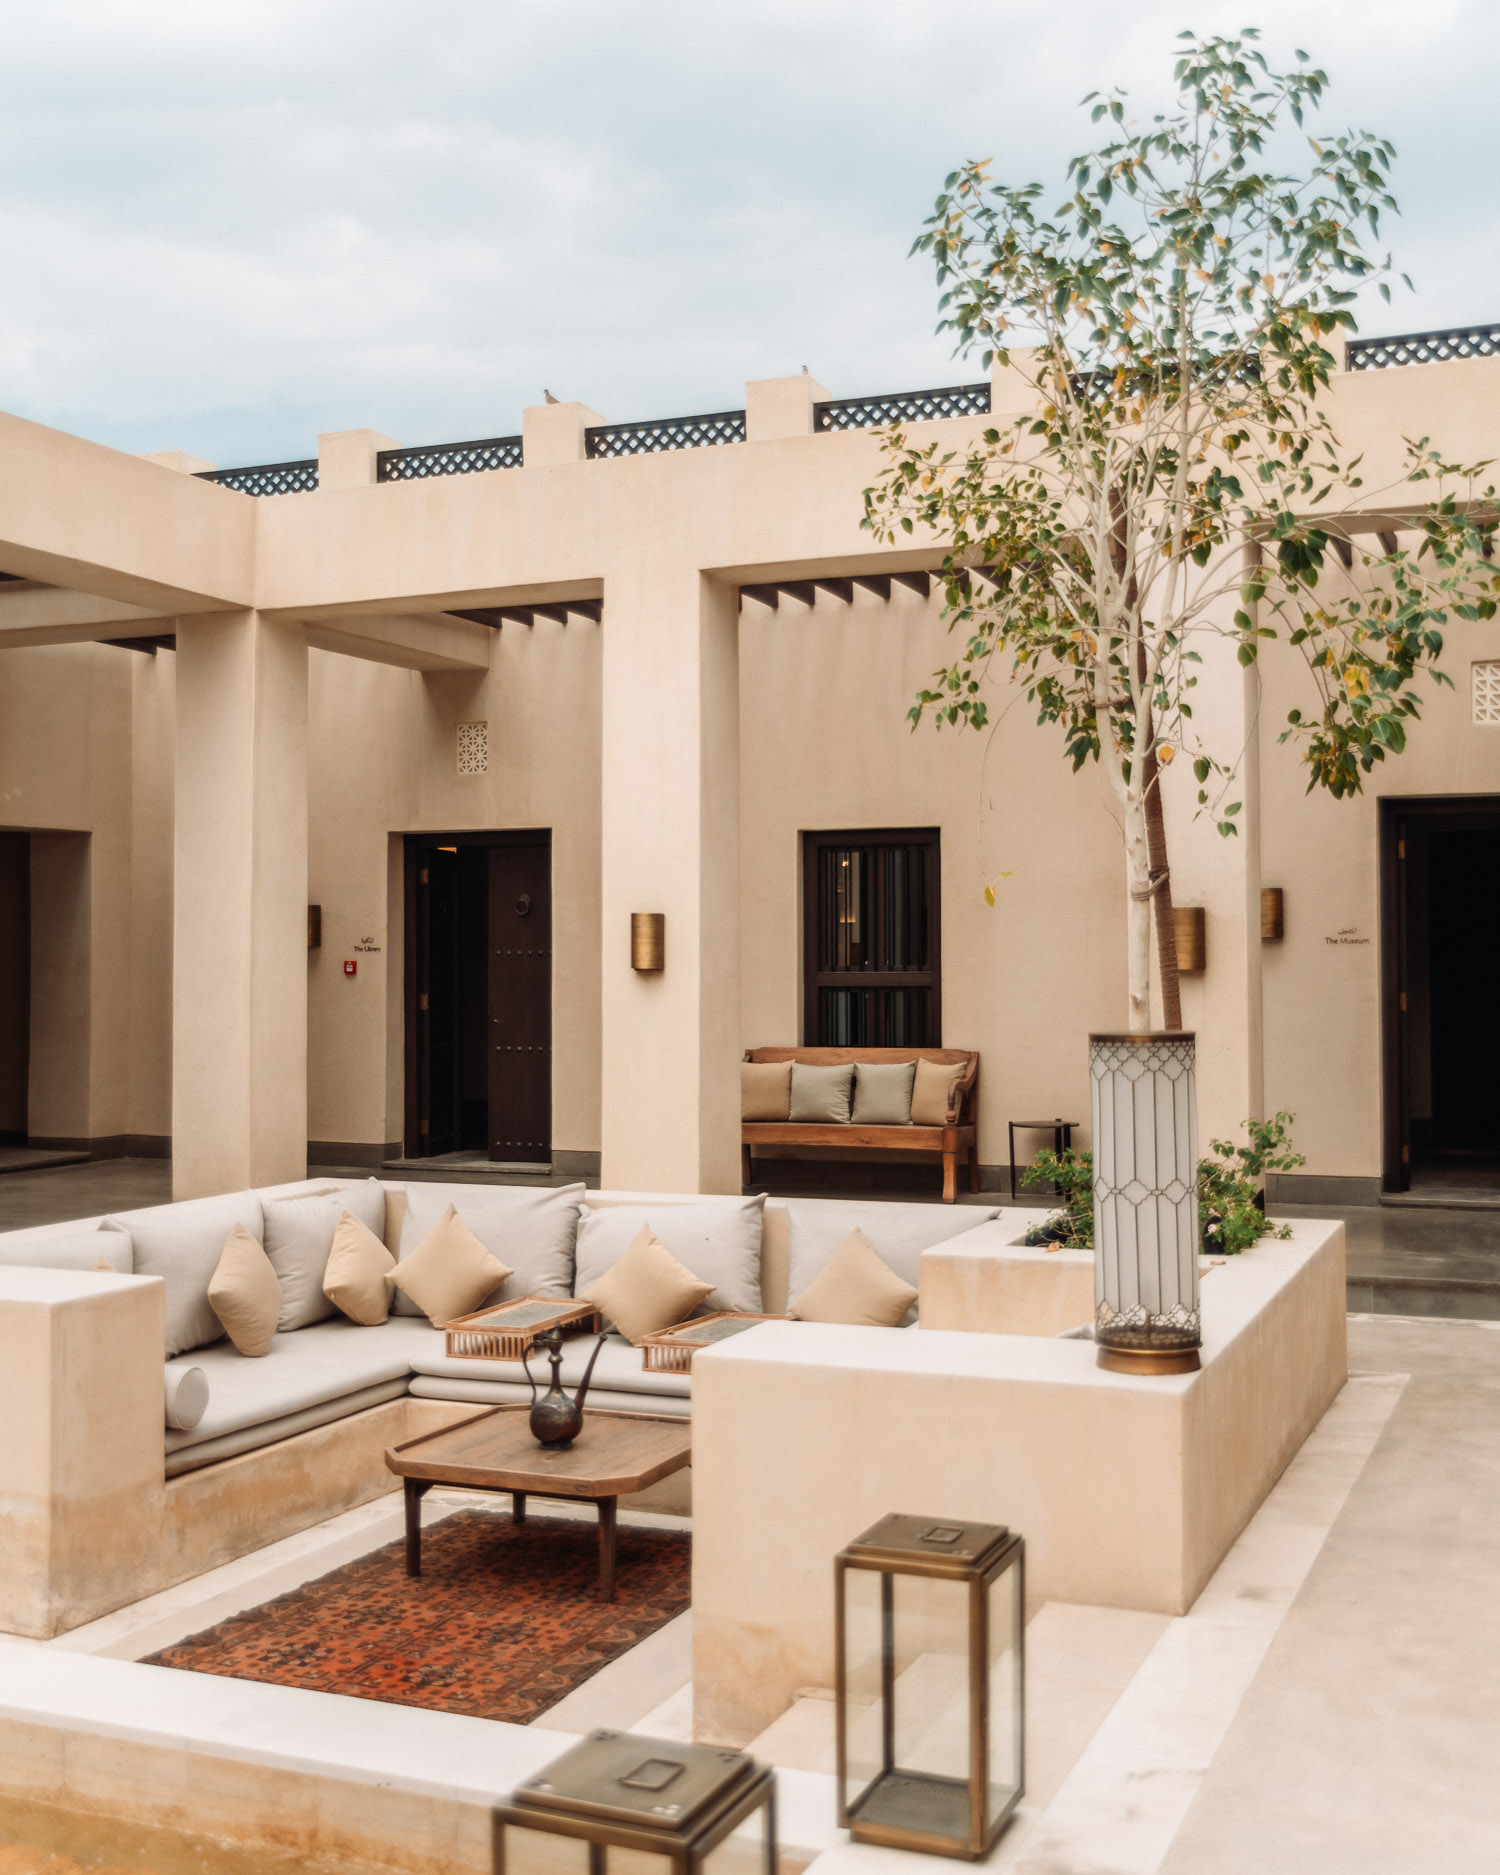 Heritage Courtyard, Al Bait Sharjah